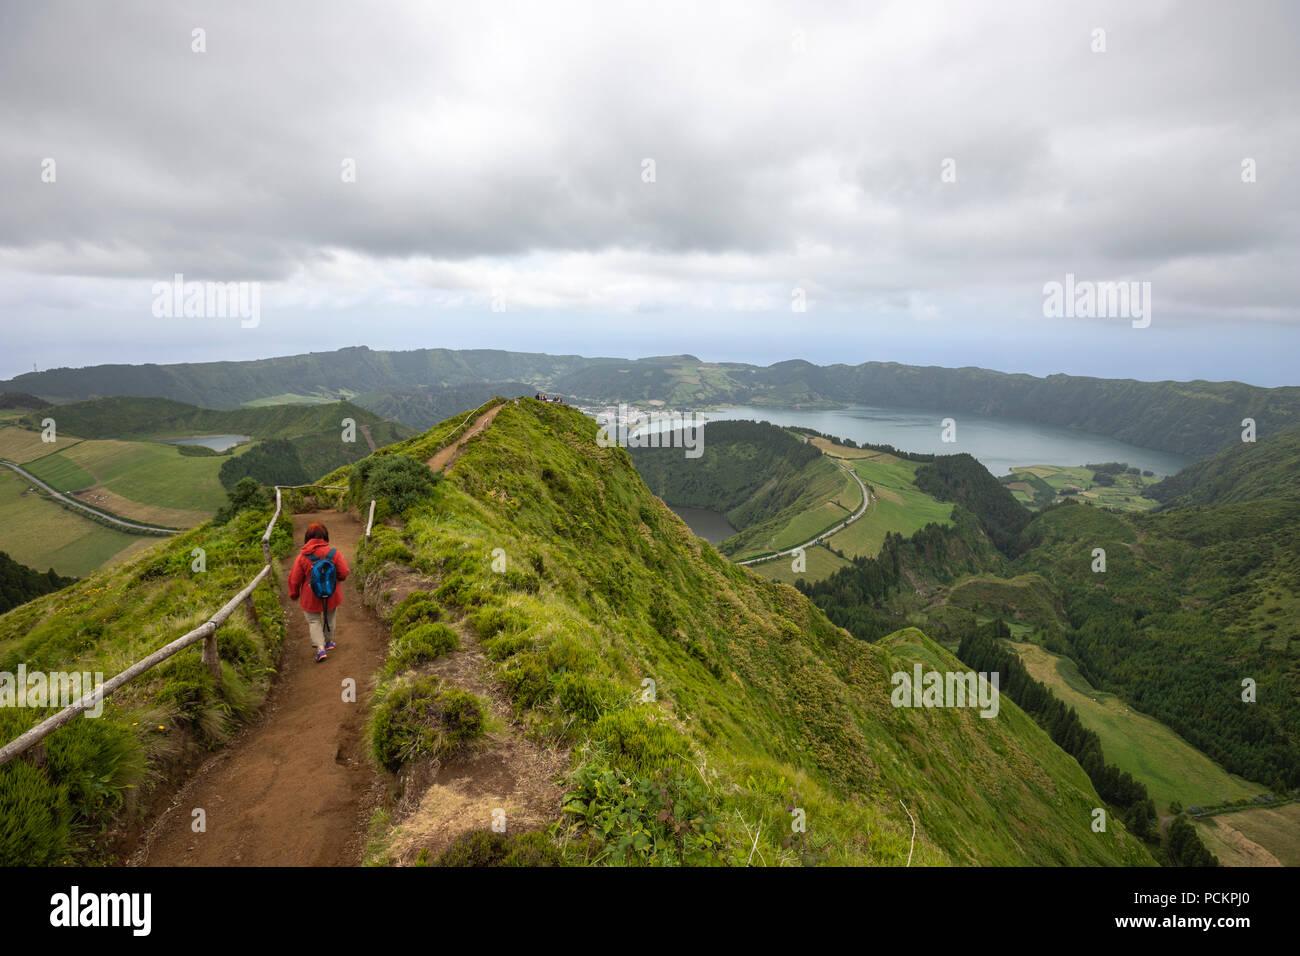 Tourists on a path leading to Lagoa do Canario Miradouro, viewpoint, and Santiago Lake and part of Sete Cidades Lake. Sao Miguel island, Azores. Stock Photo